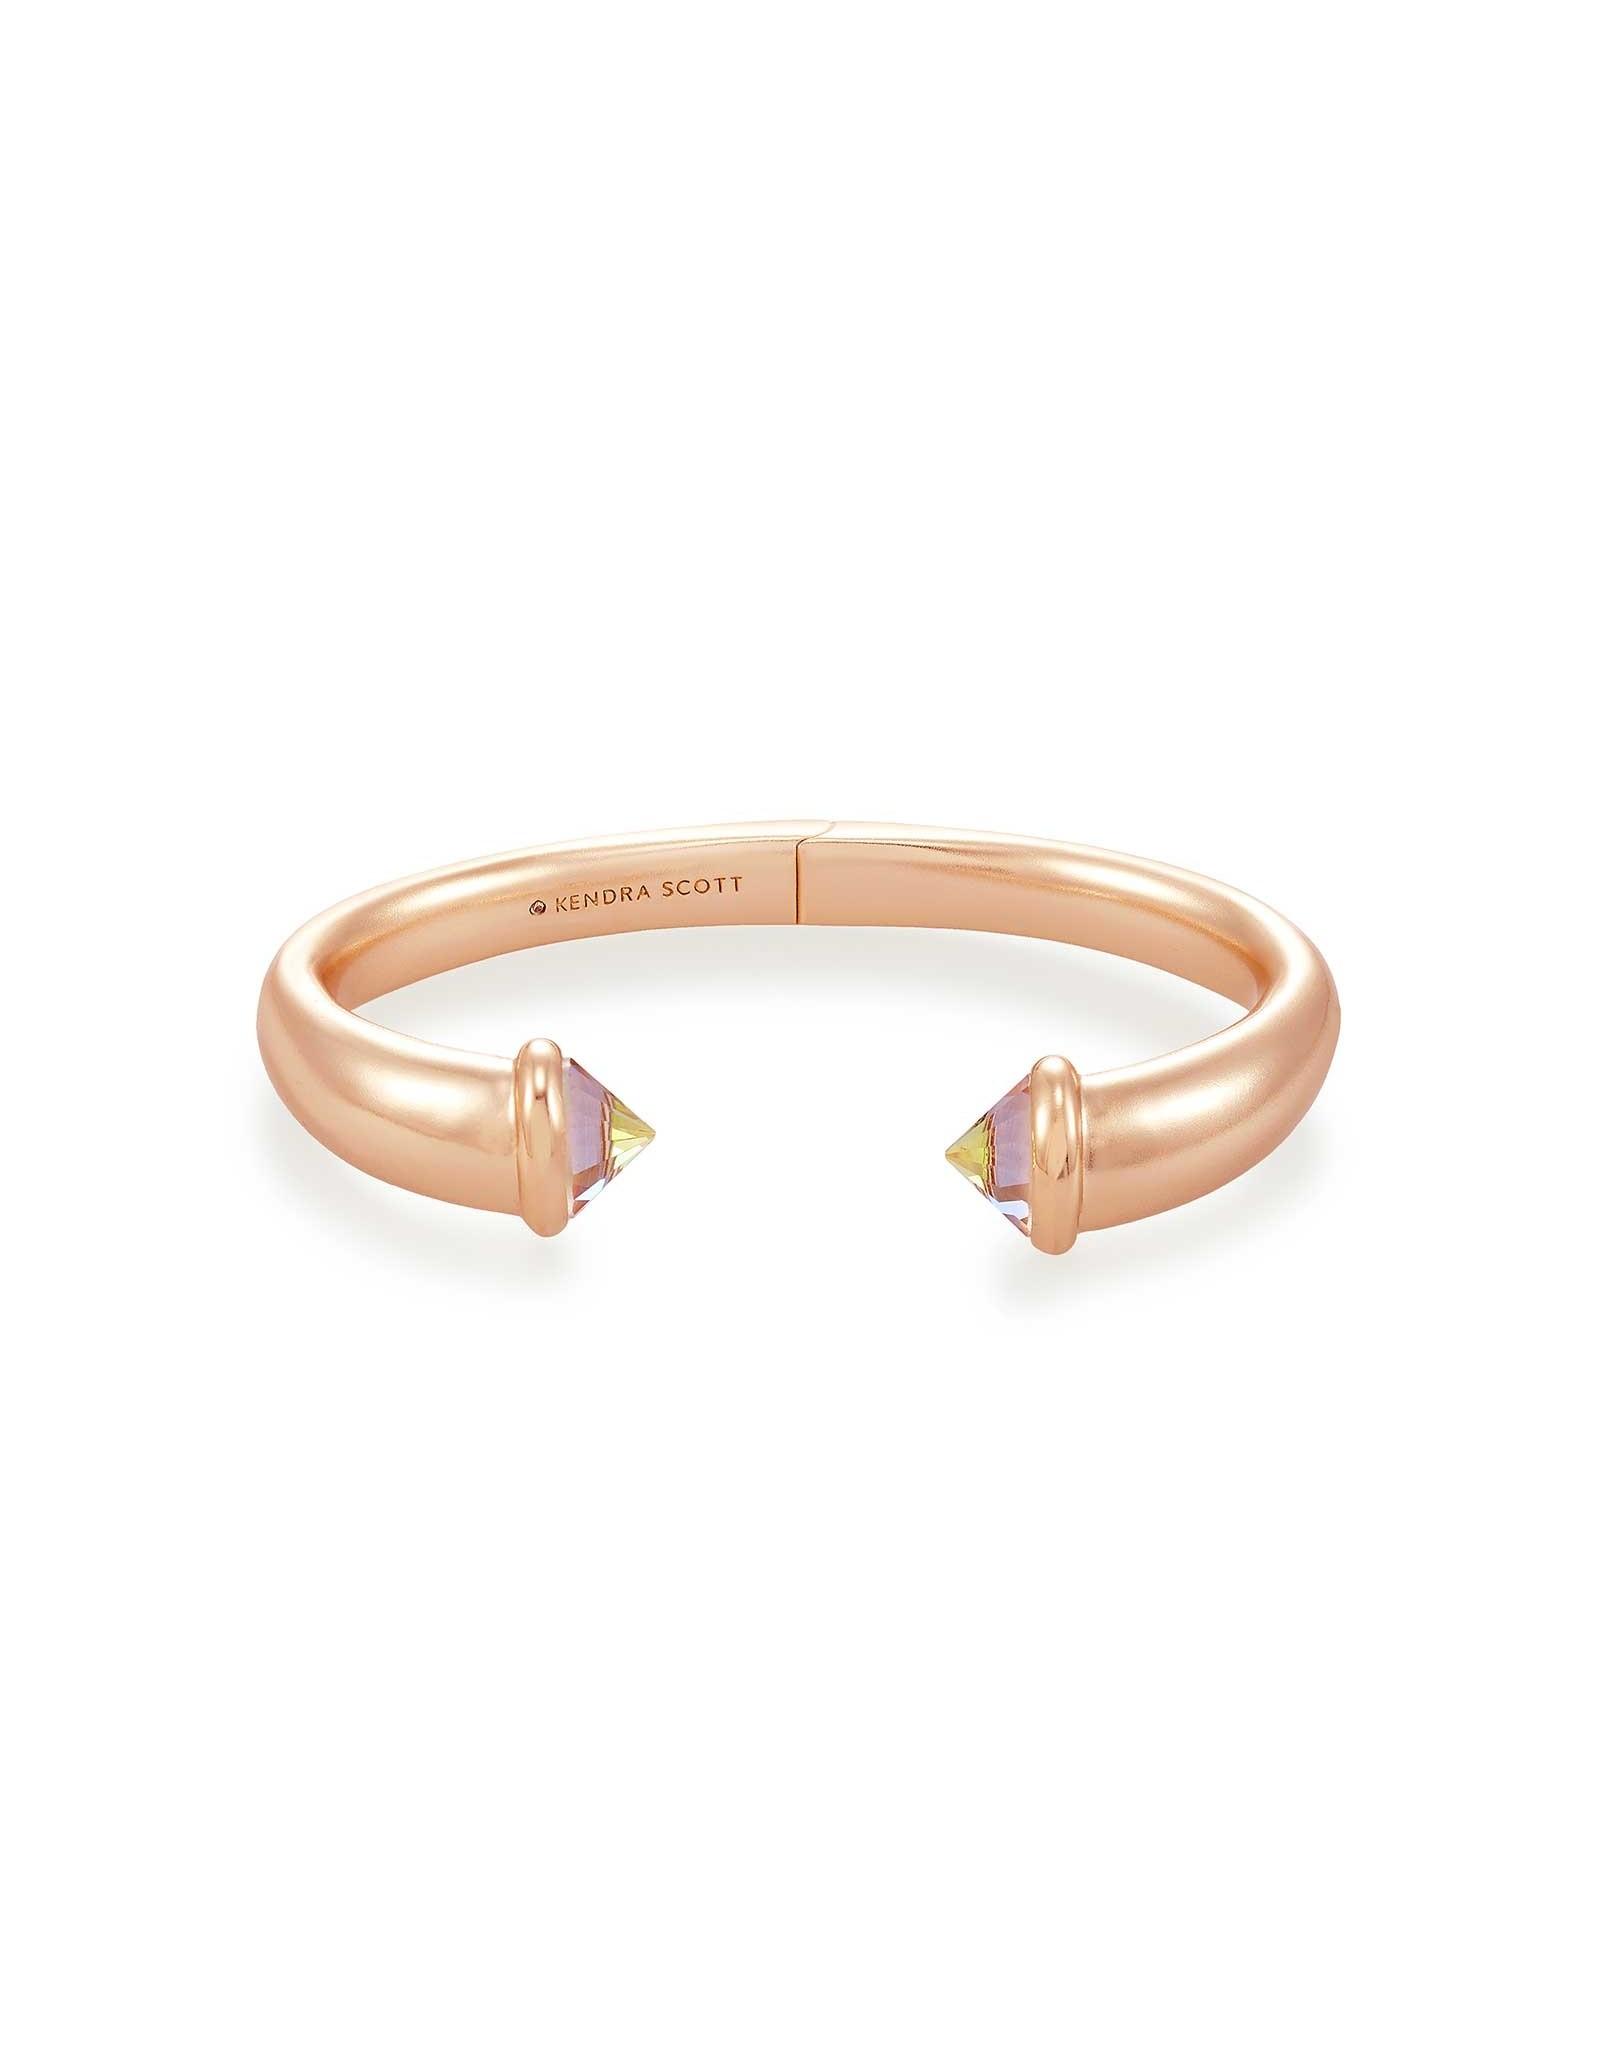 Kendra Scott Jolie Rose Gold Cuff Bracelet Dichroic Glass